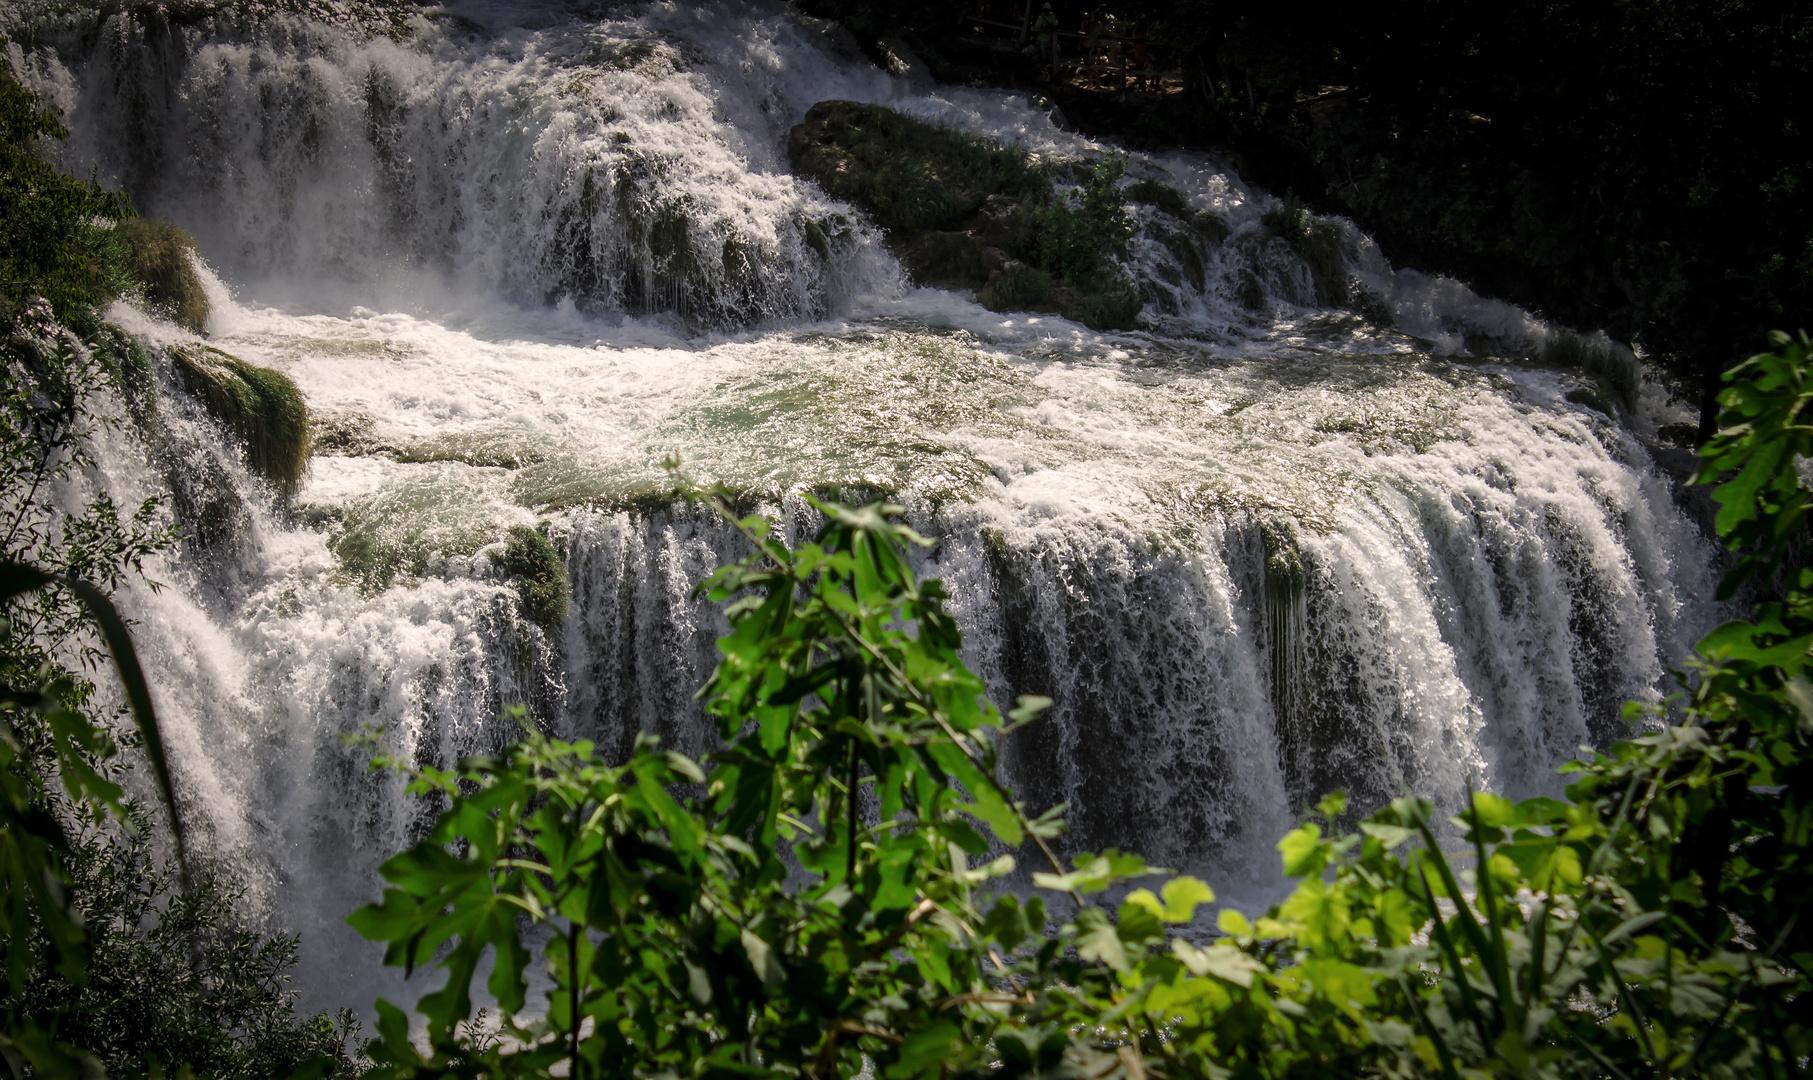 Naturpark Krka in Dalmatien bei Sibenik